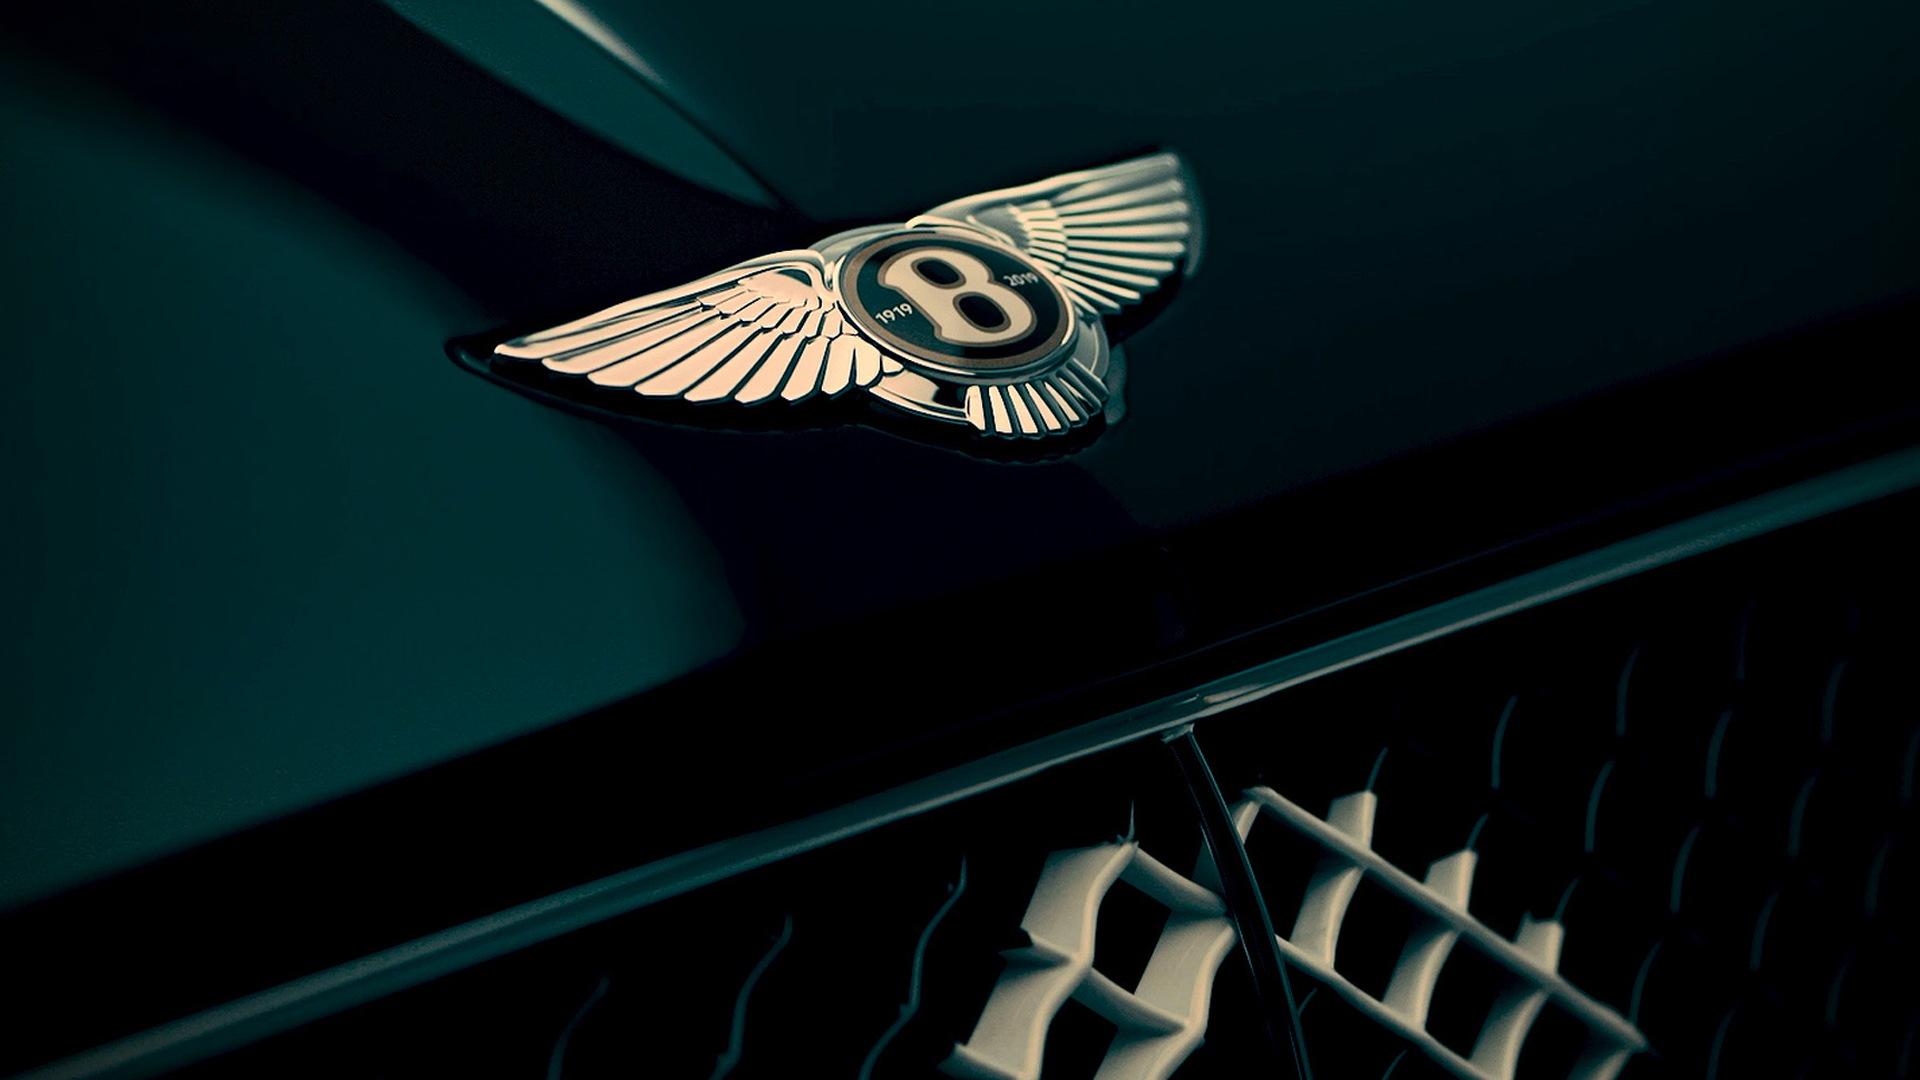 Teaser for special edition celebrating Bentley's centennial